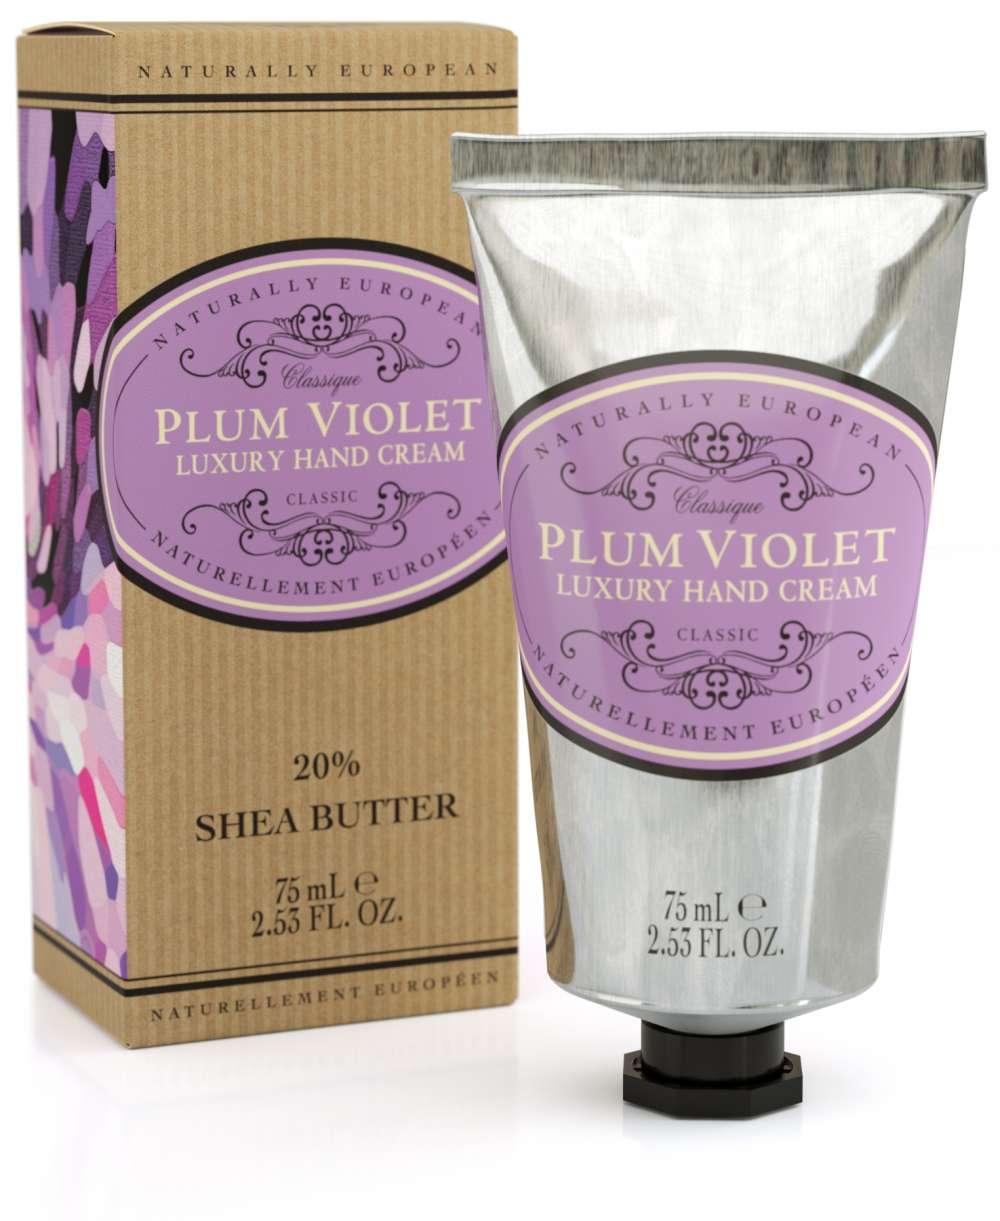 Naturally European Plum Violet Hand Cream